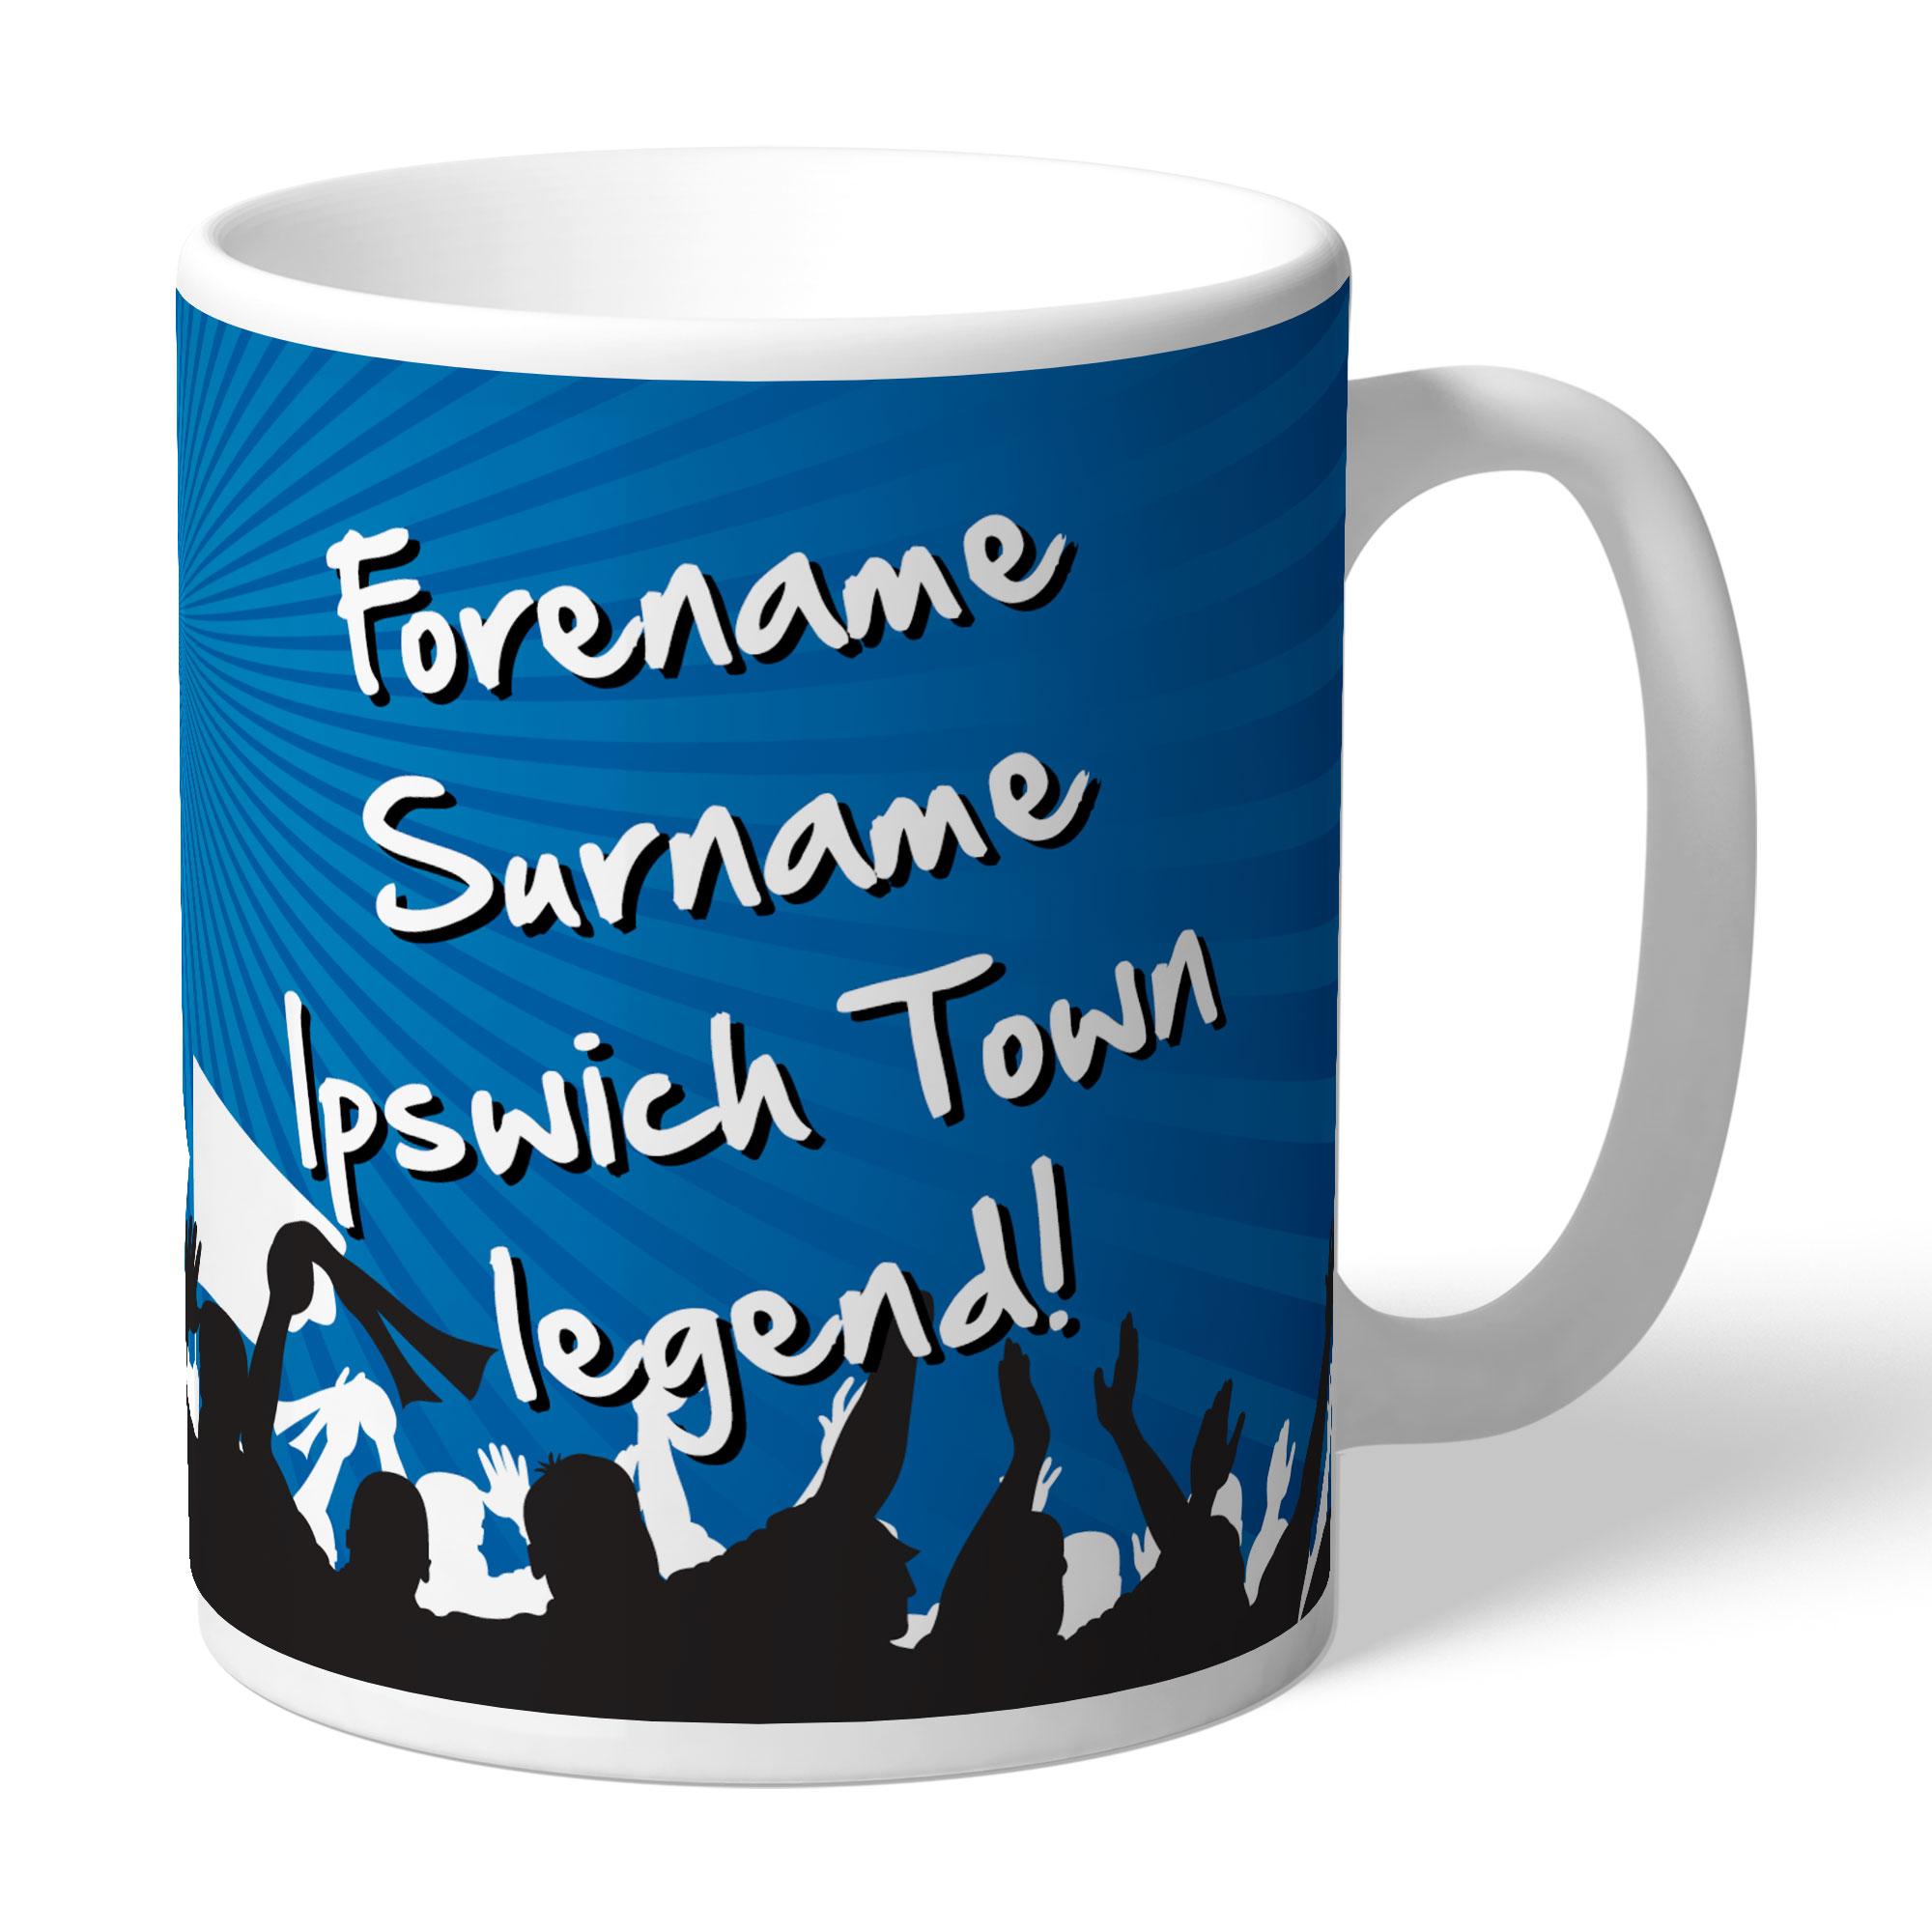 Ipswich Town FC Legend Mug